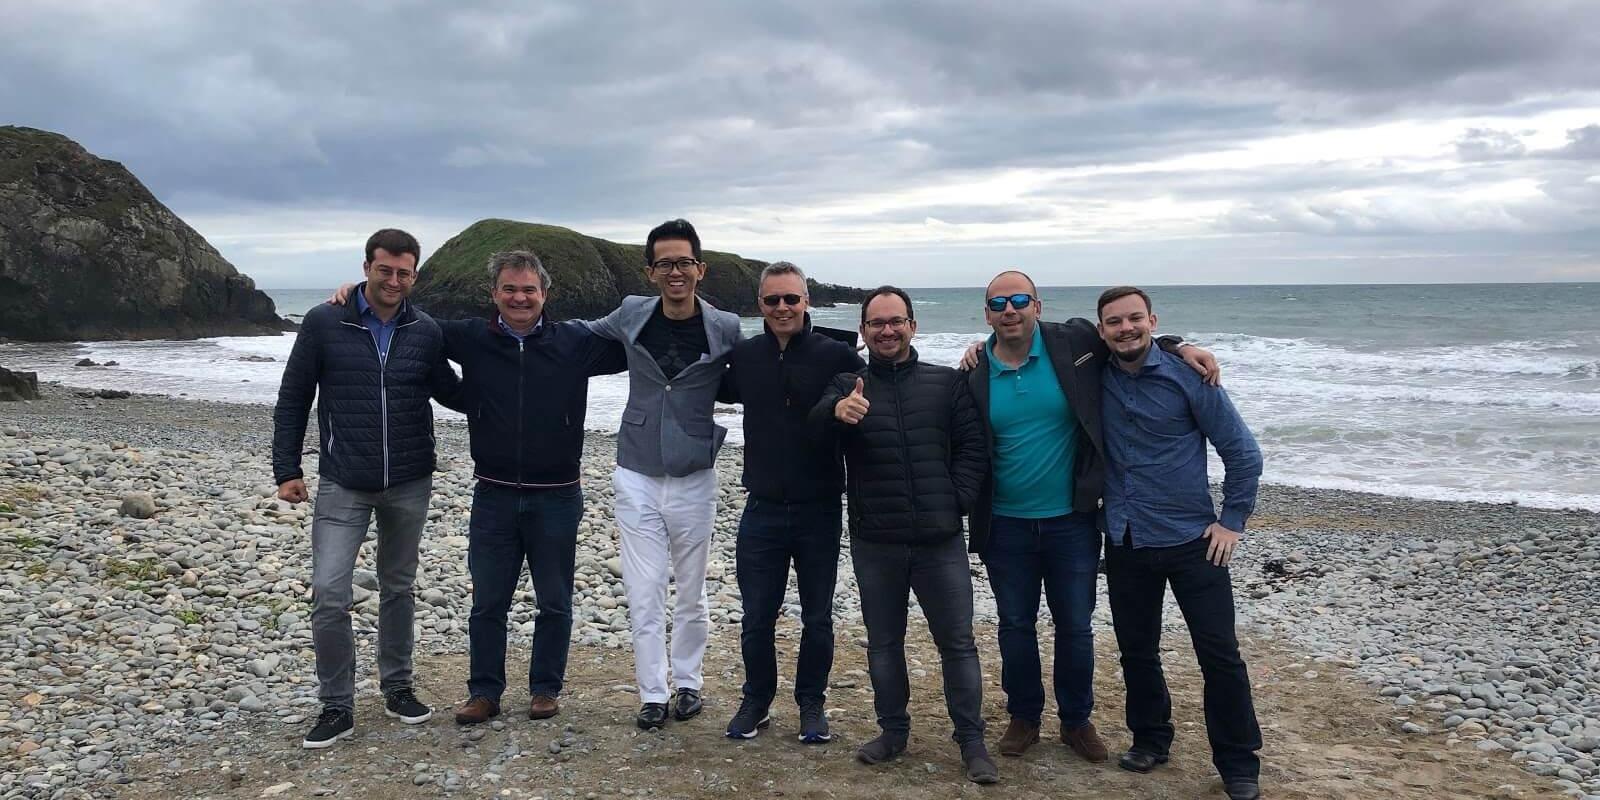 Skycatch partners with NearForm for large data platform development